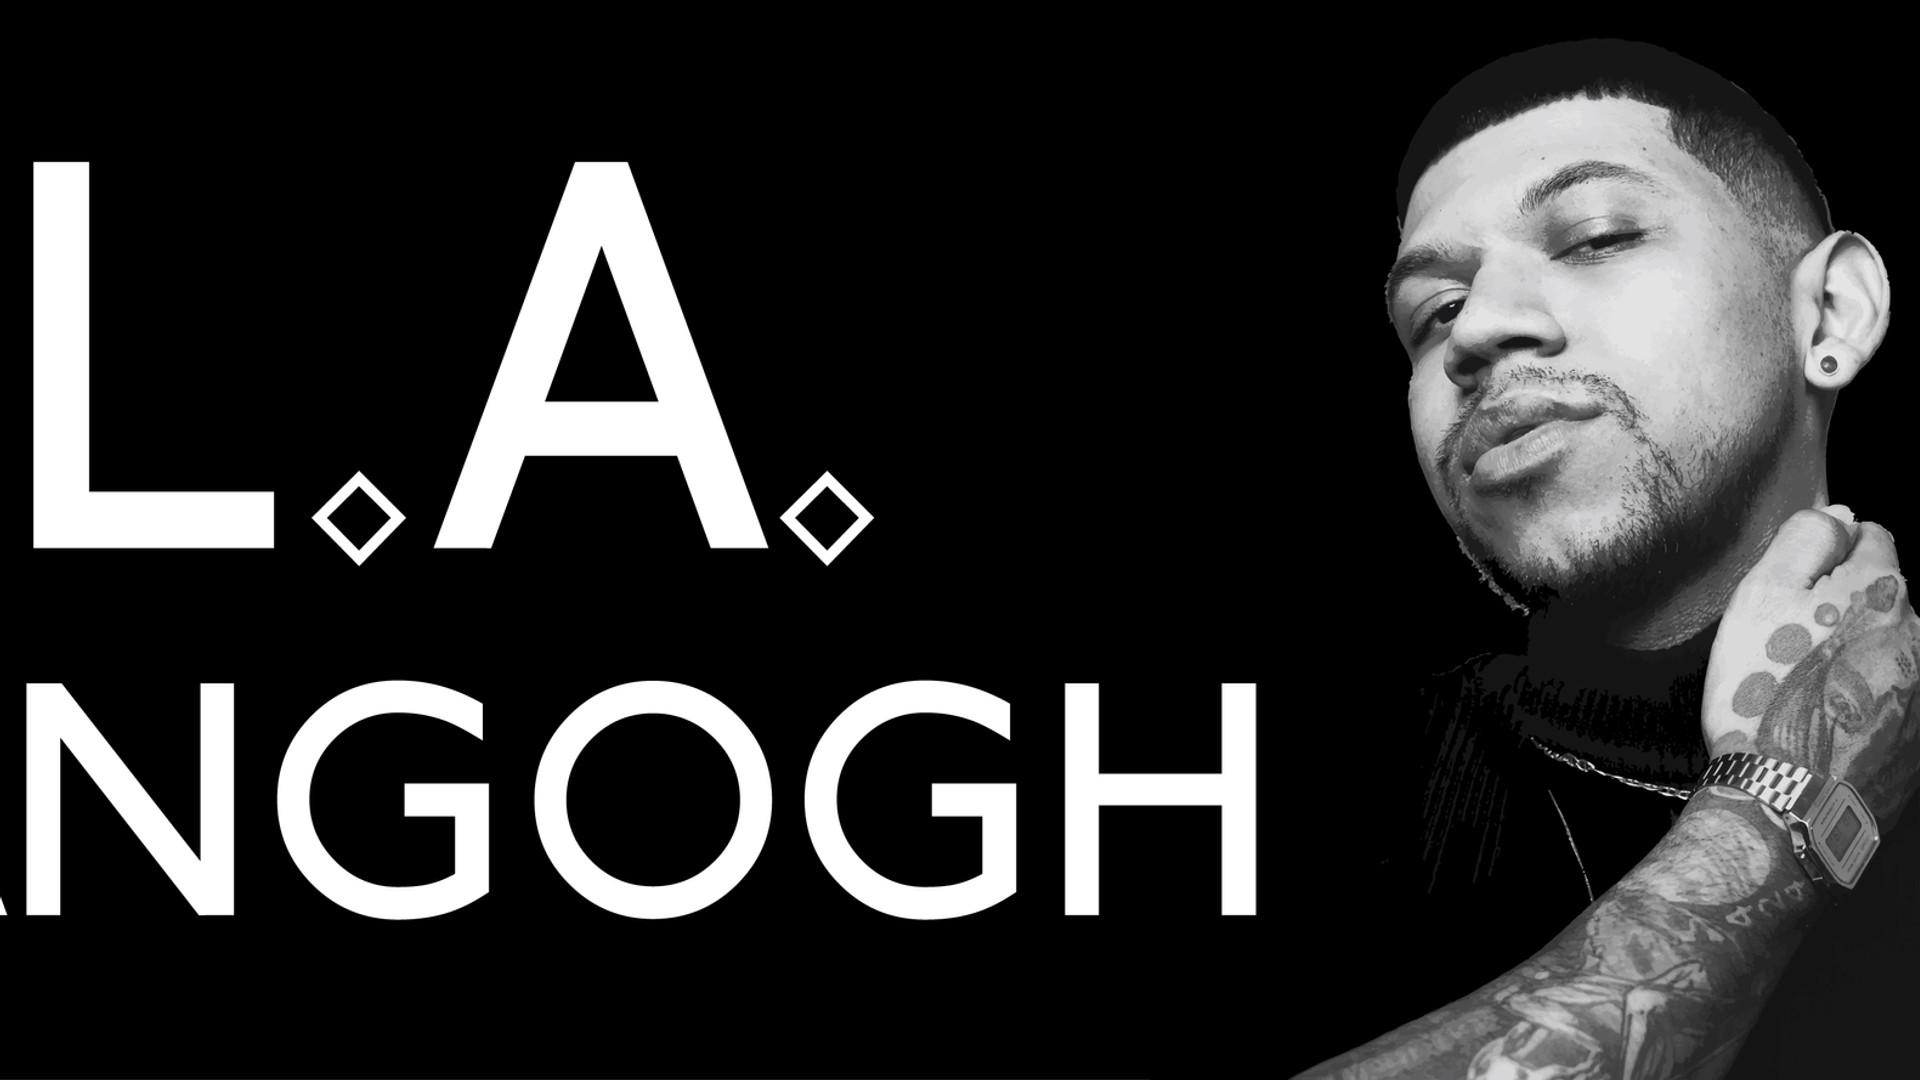 L.A. VanGogh